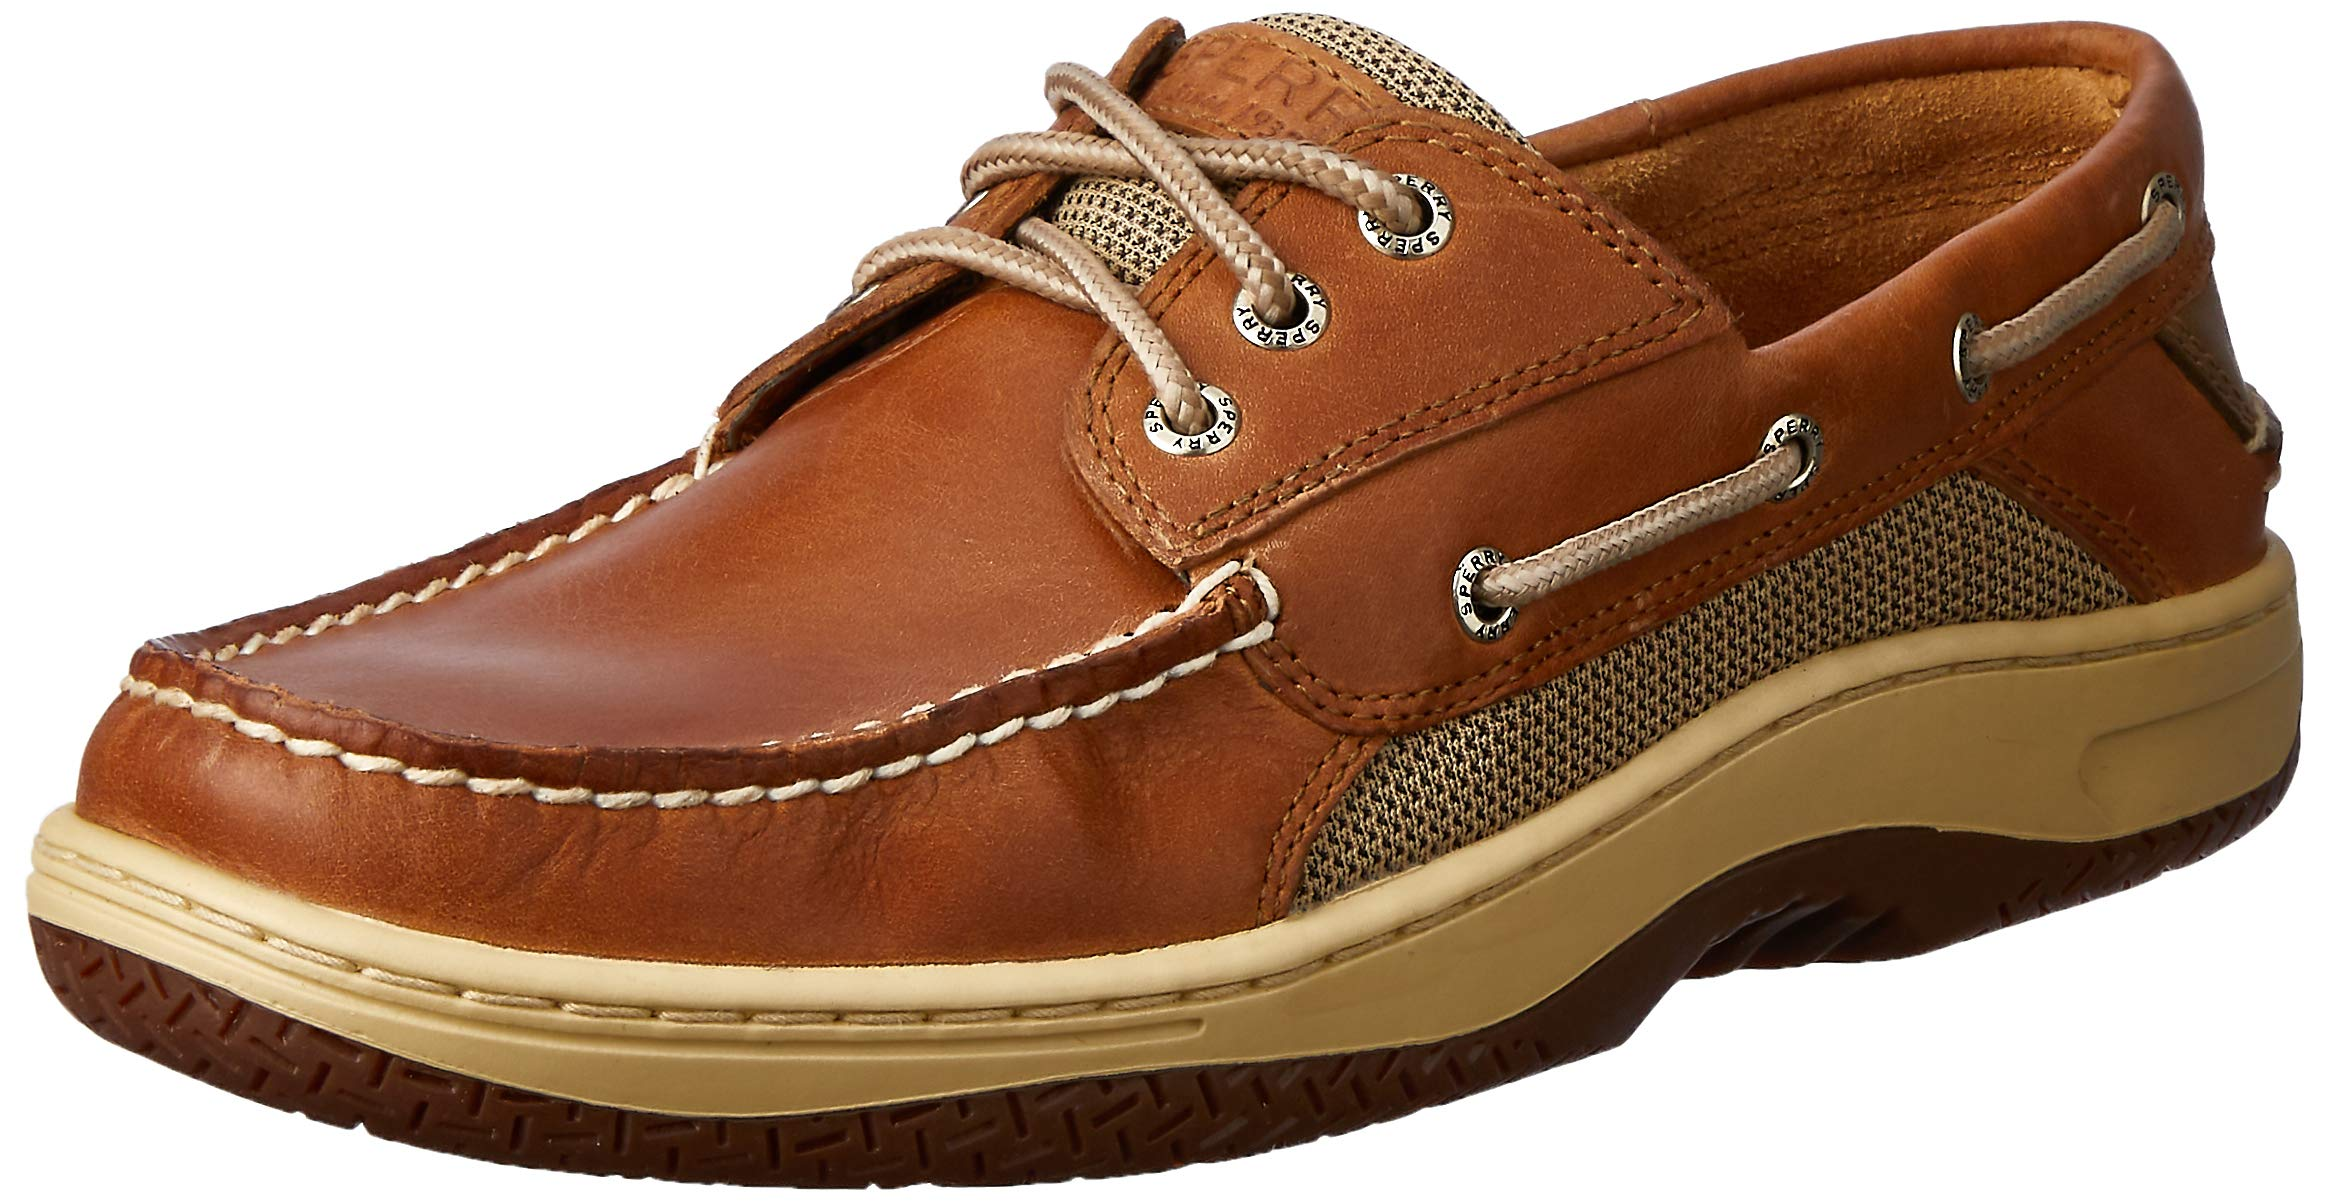 Sperry Men's Billfish 3-Eye Boat Shoe, Dark Tan, 10.5 M US